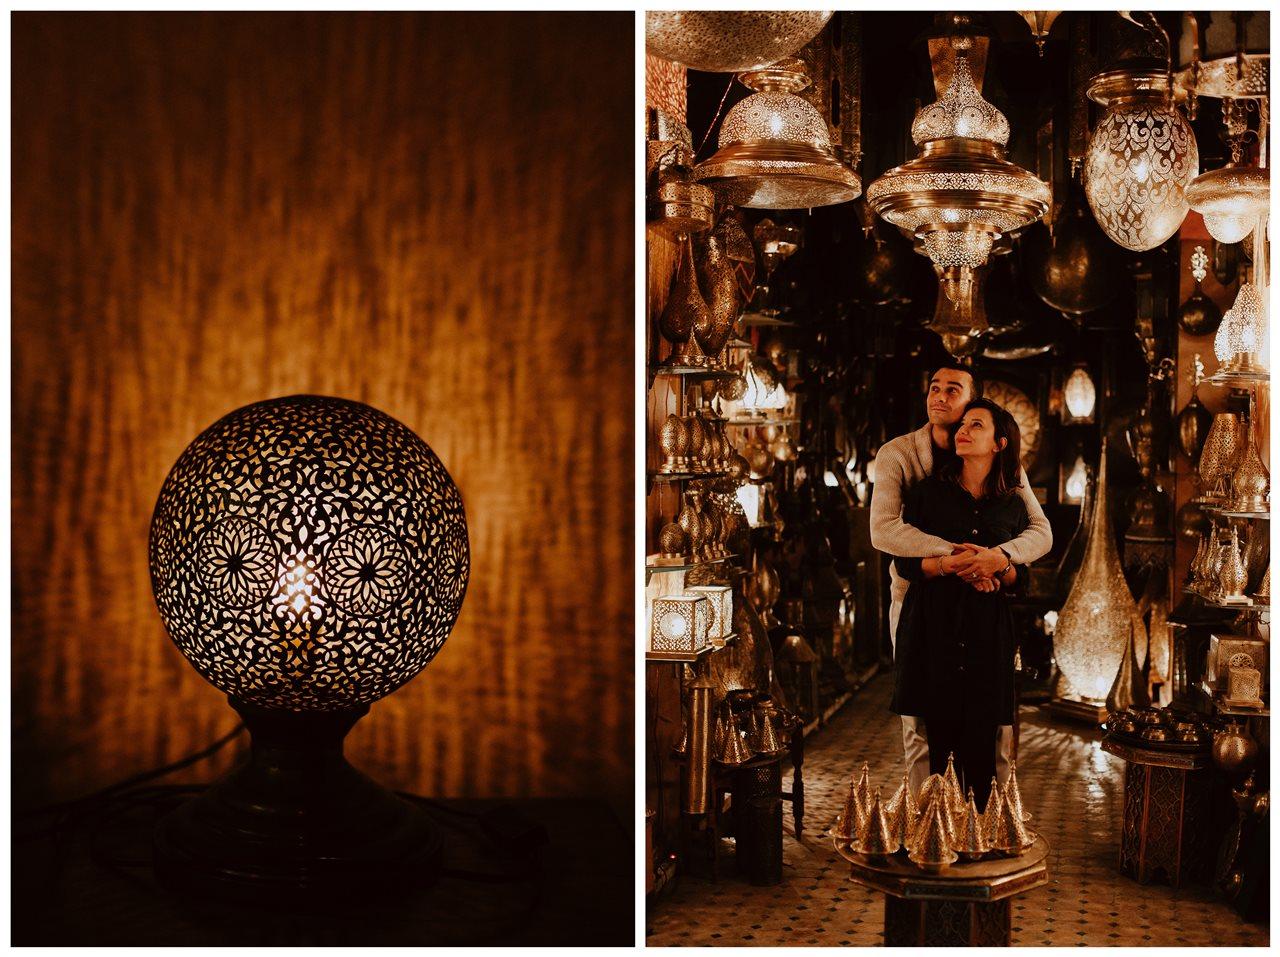 séance couple fès magasin lampe marocaine